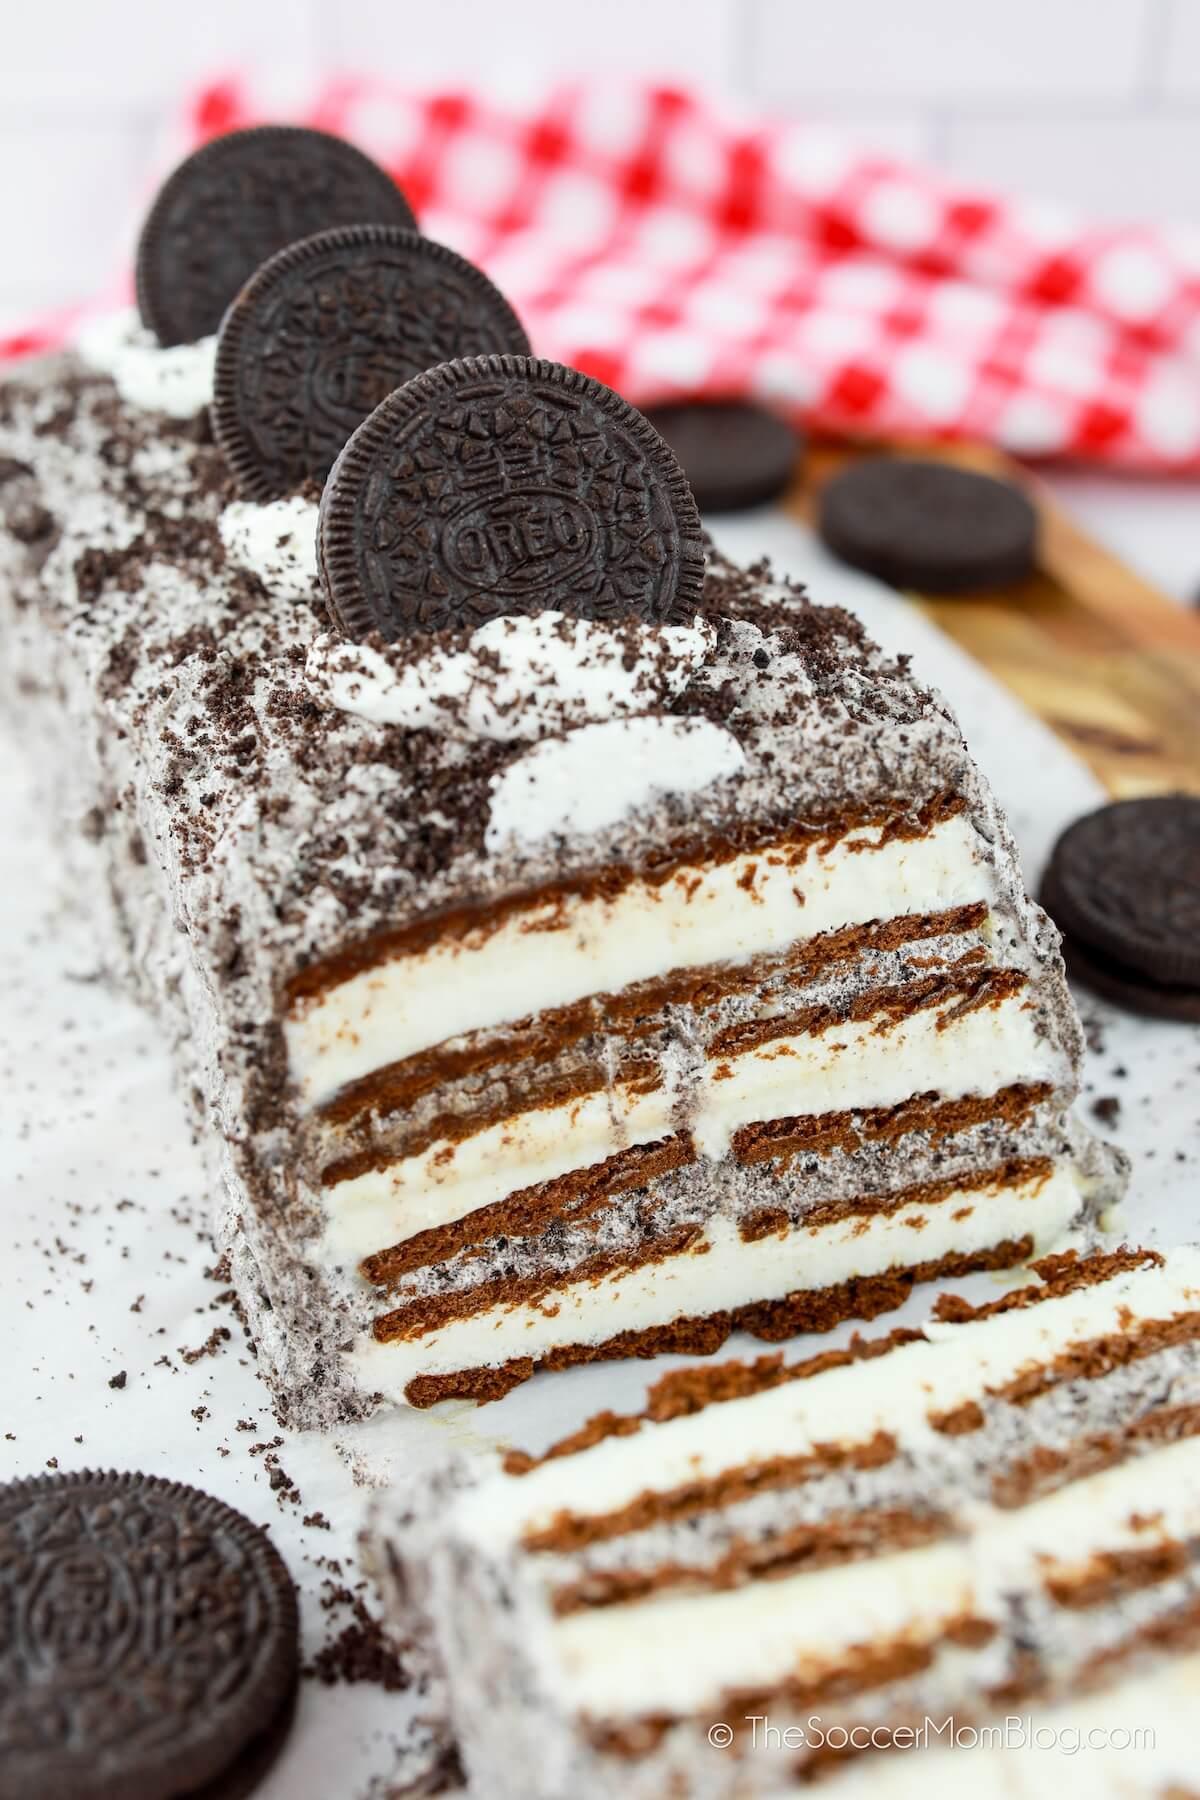 ice cream cake made with ice cream sandwiches